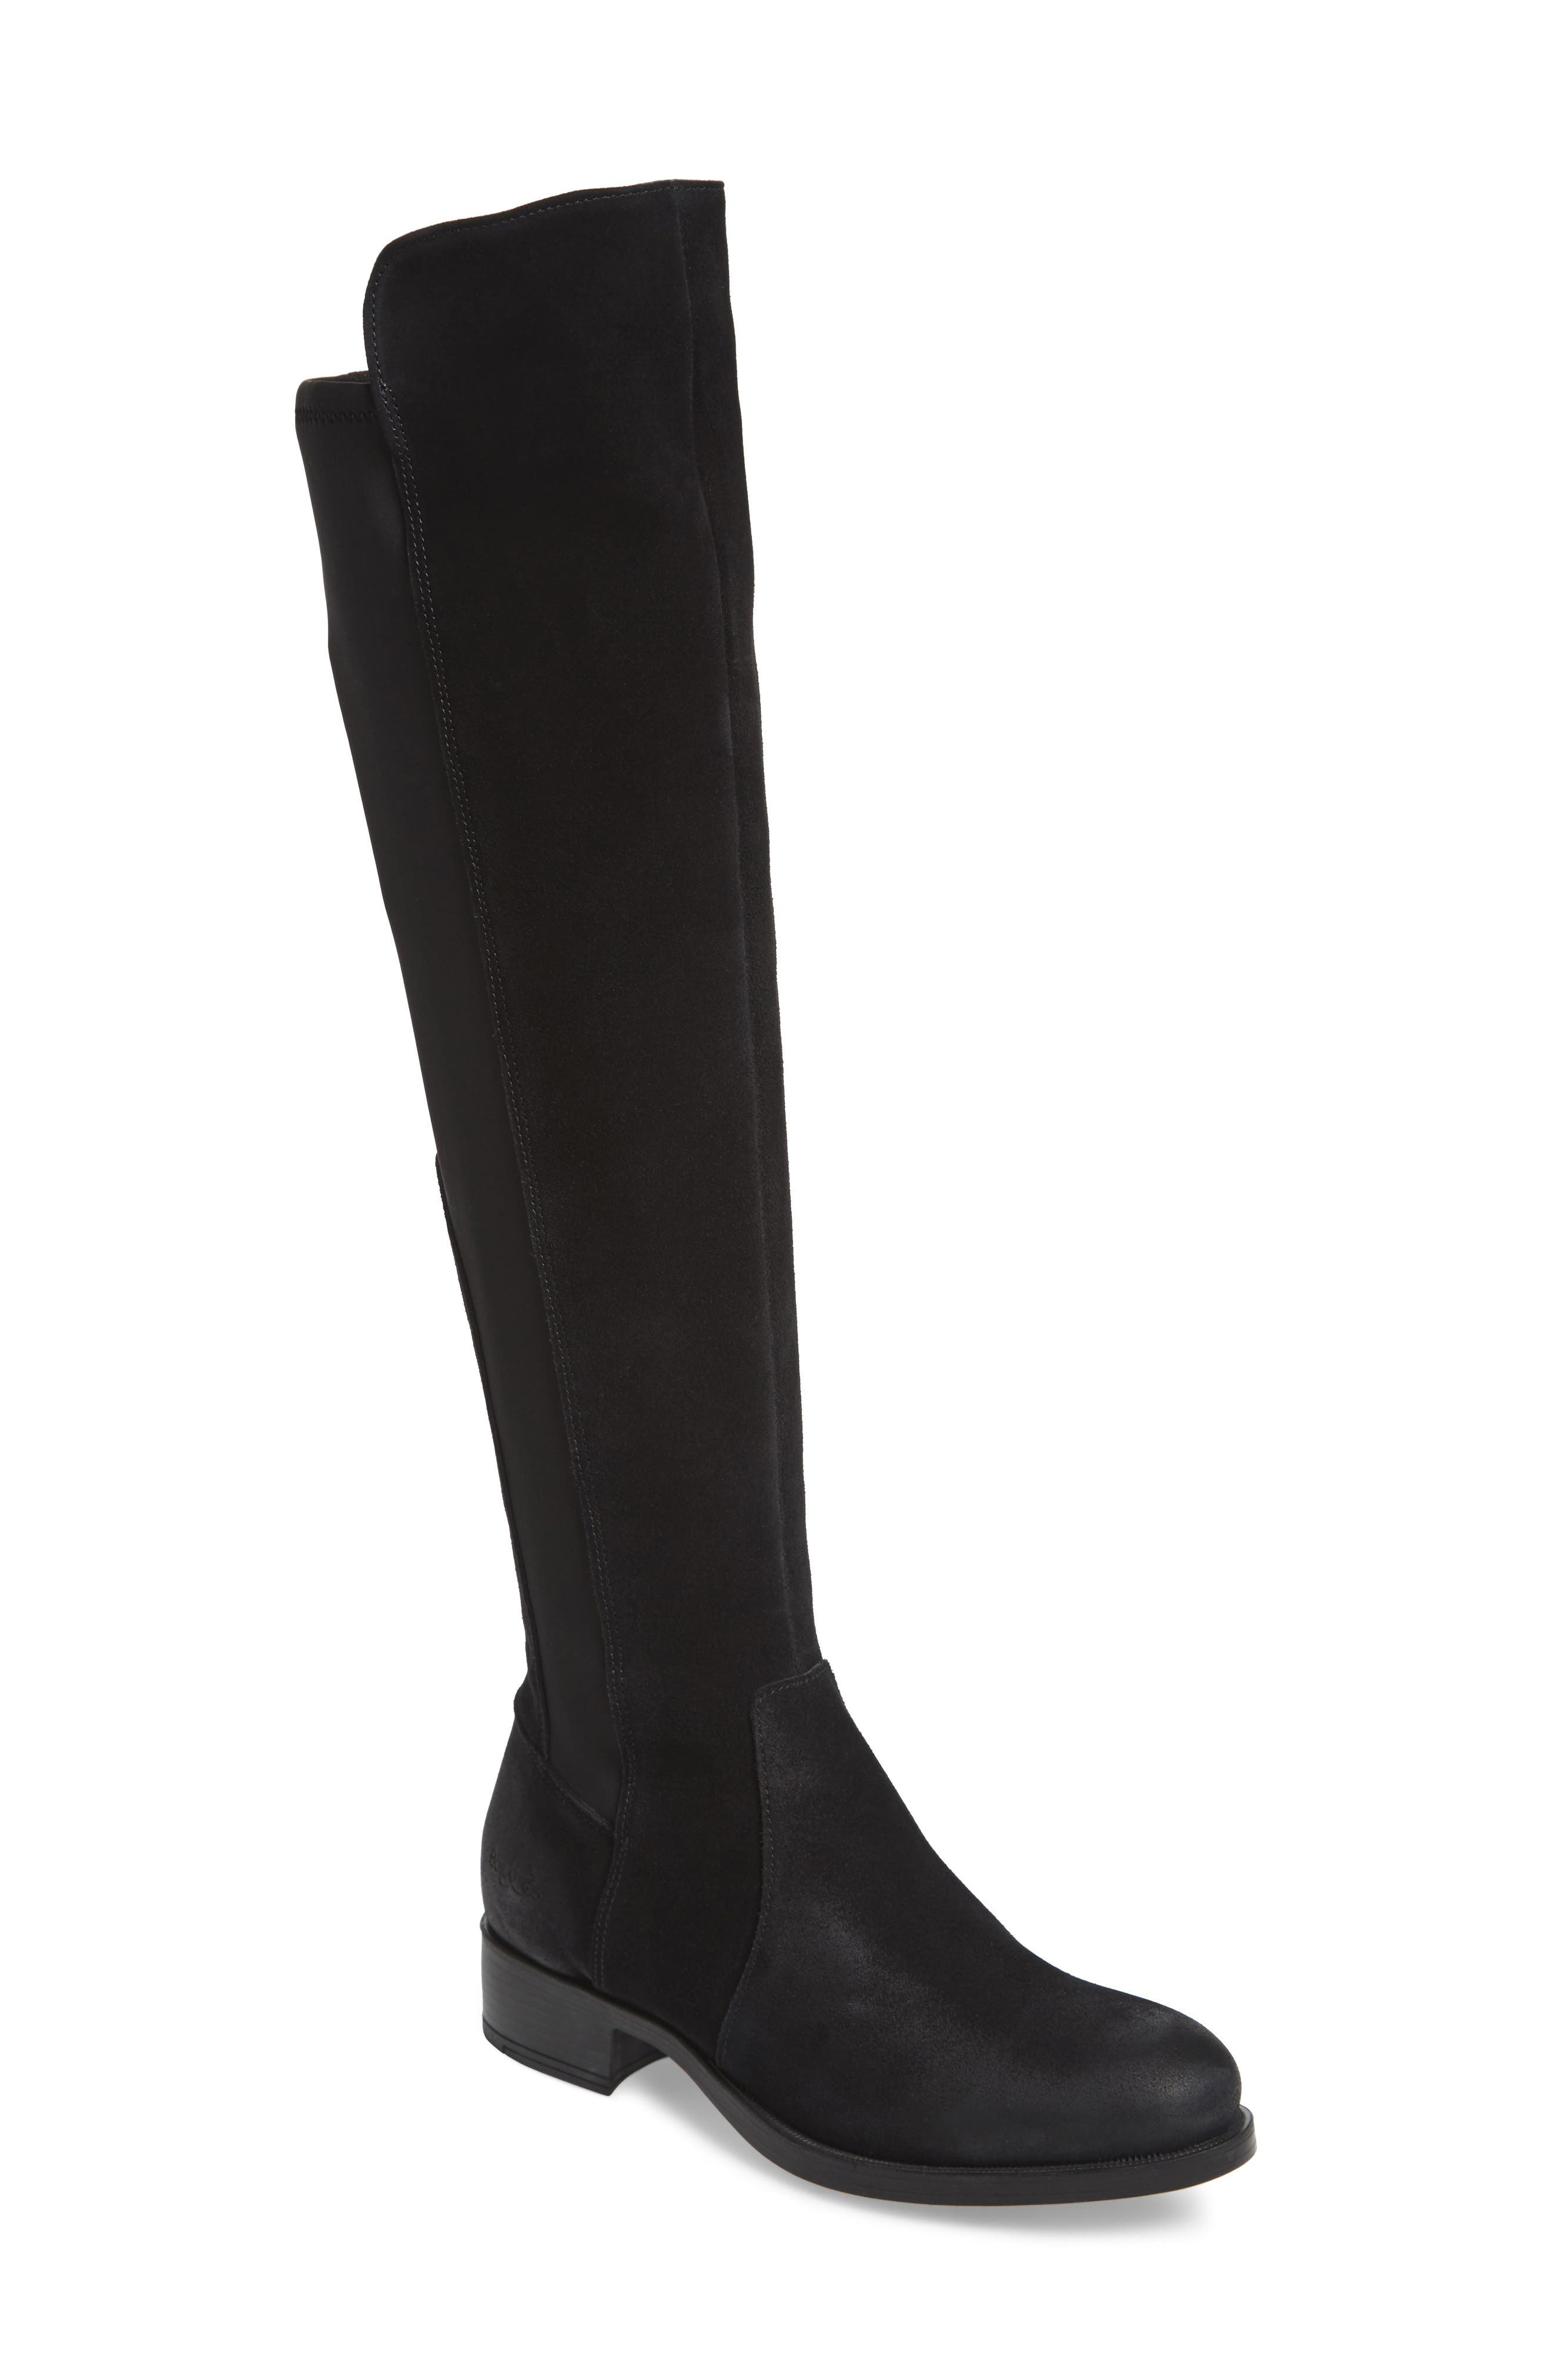 Alternate Image 1 Selected - Bos. & Co. Bunt Waterproof Over the Knee Boot (Women)